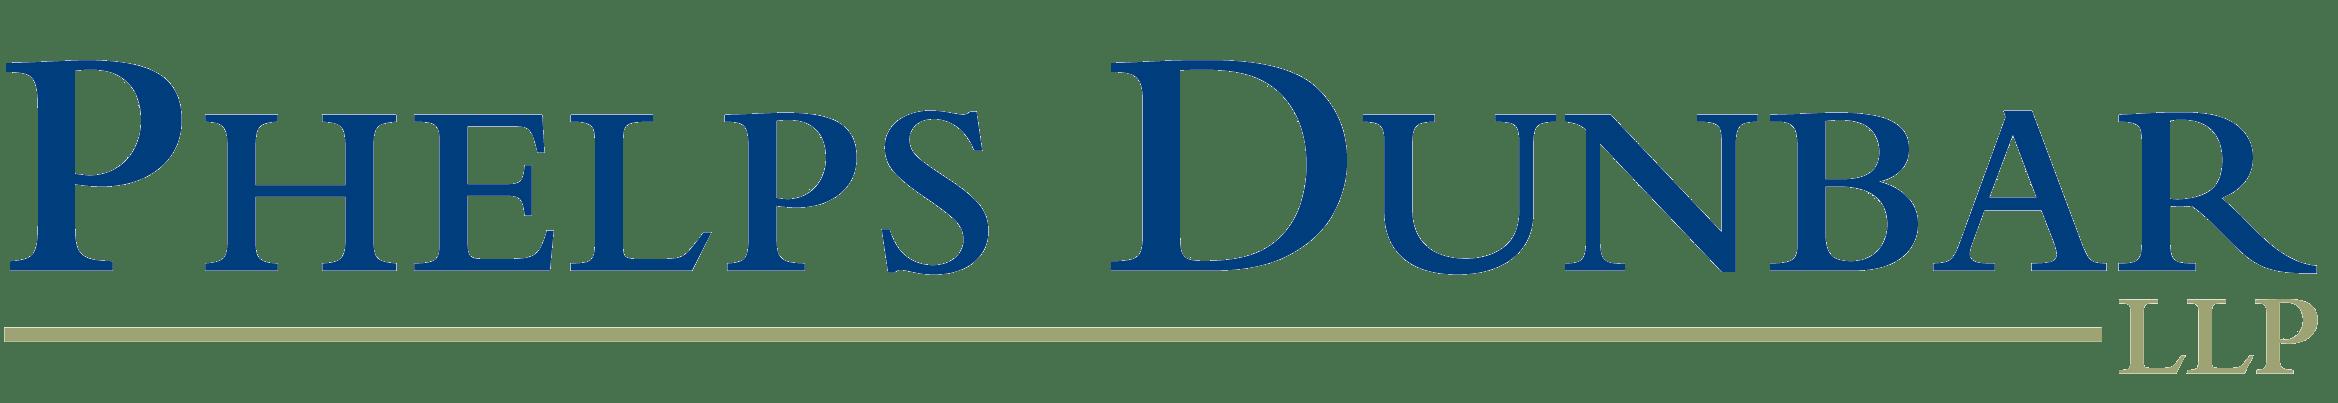 Phelps Dunbar LLP | Richard Johnson